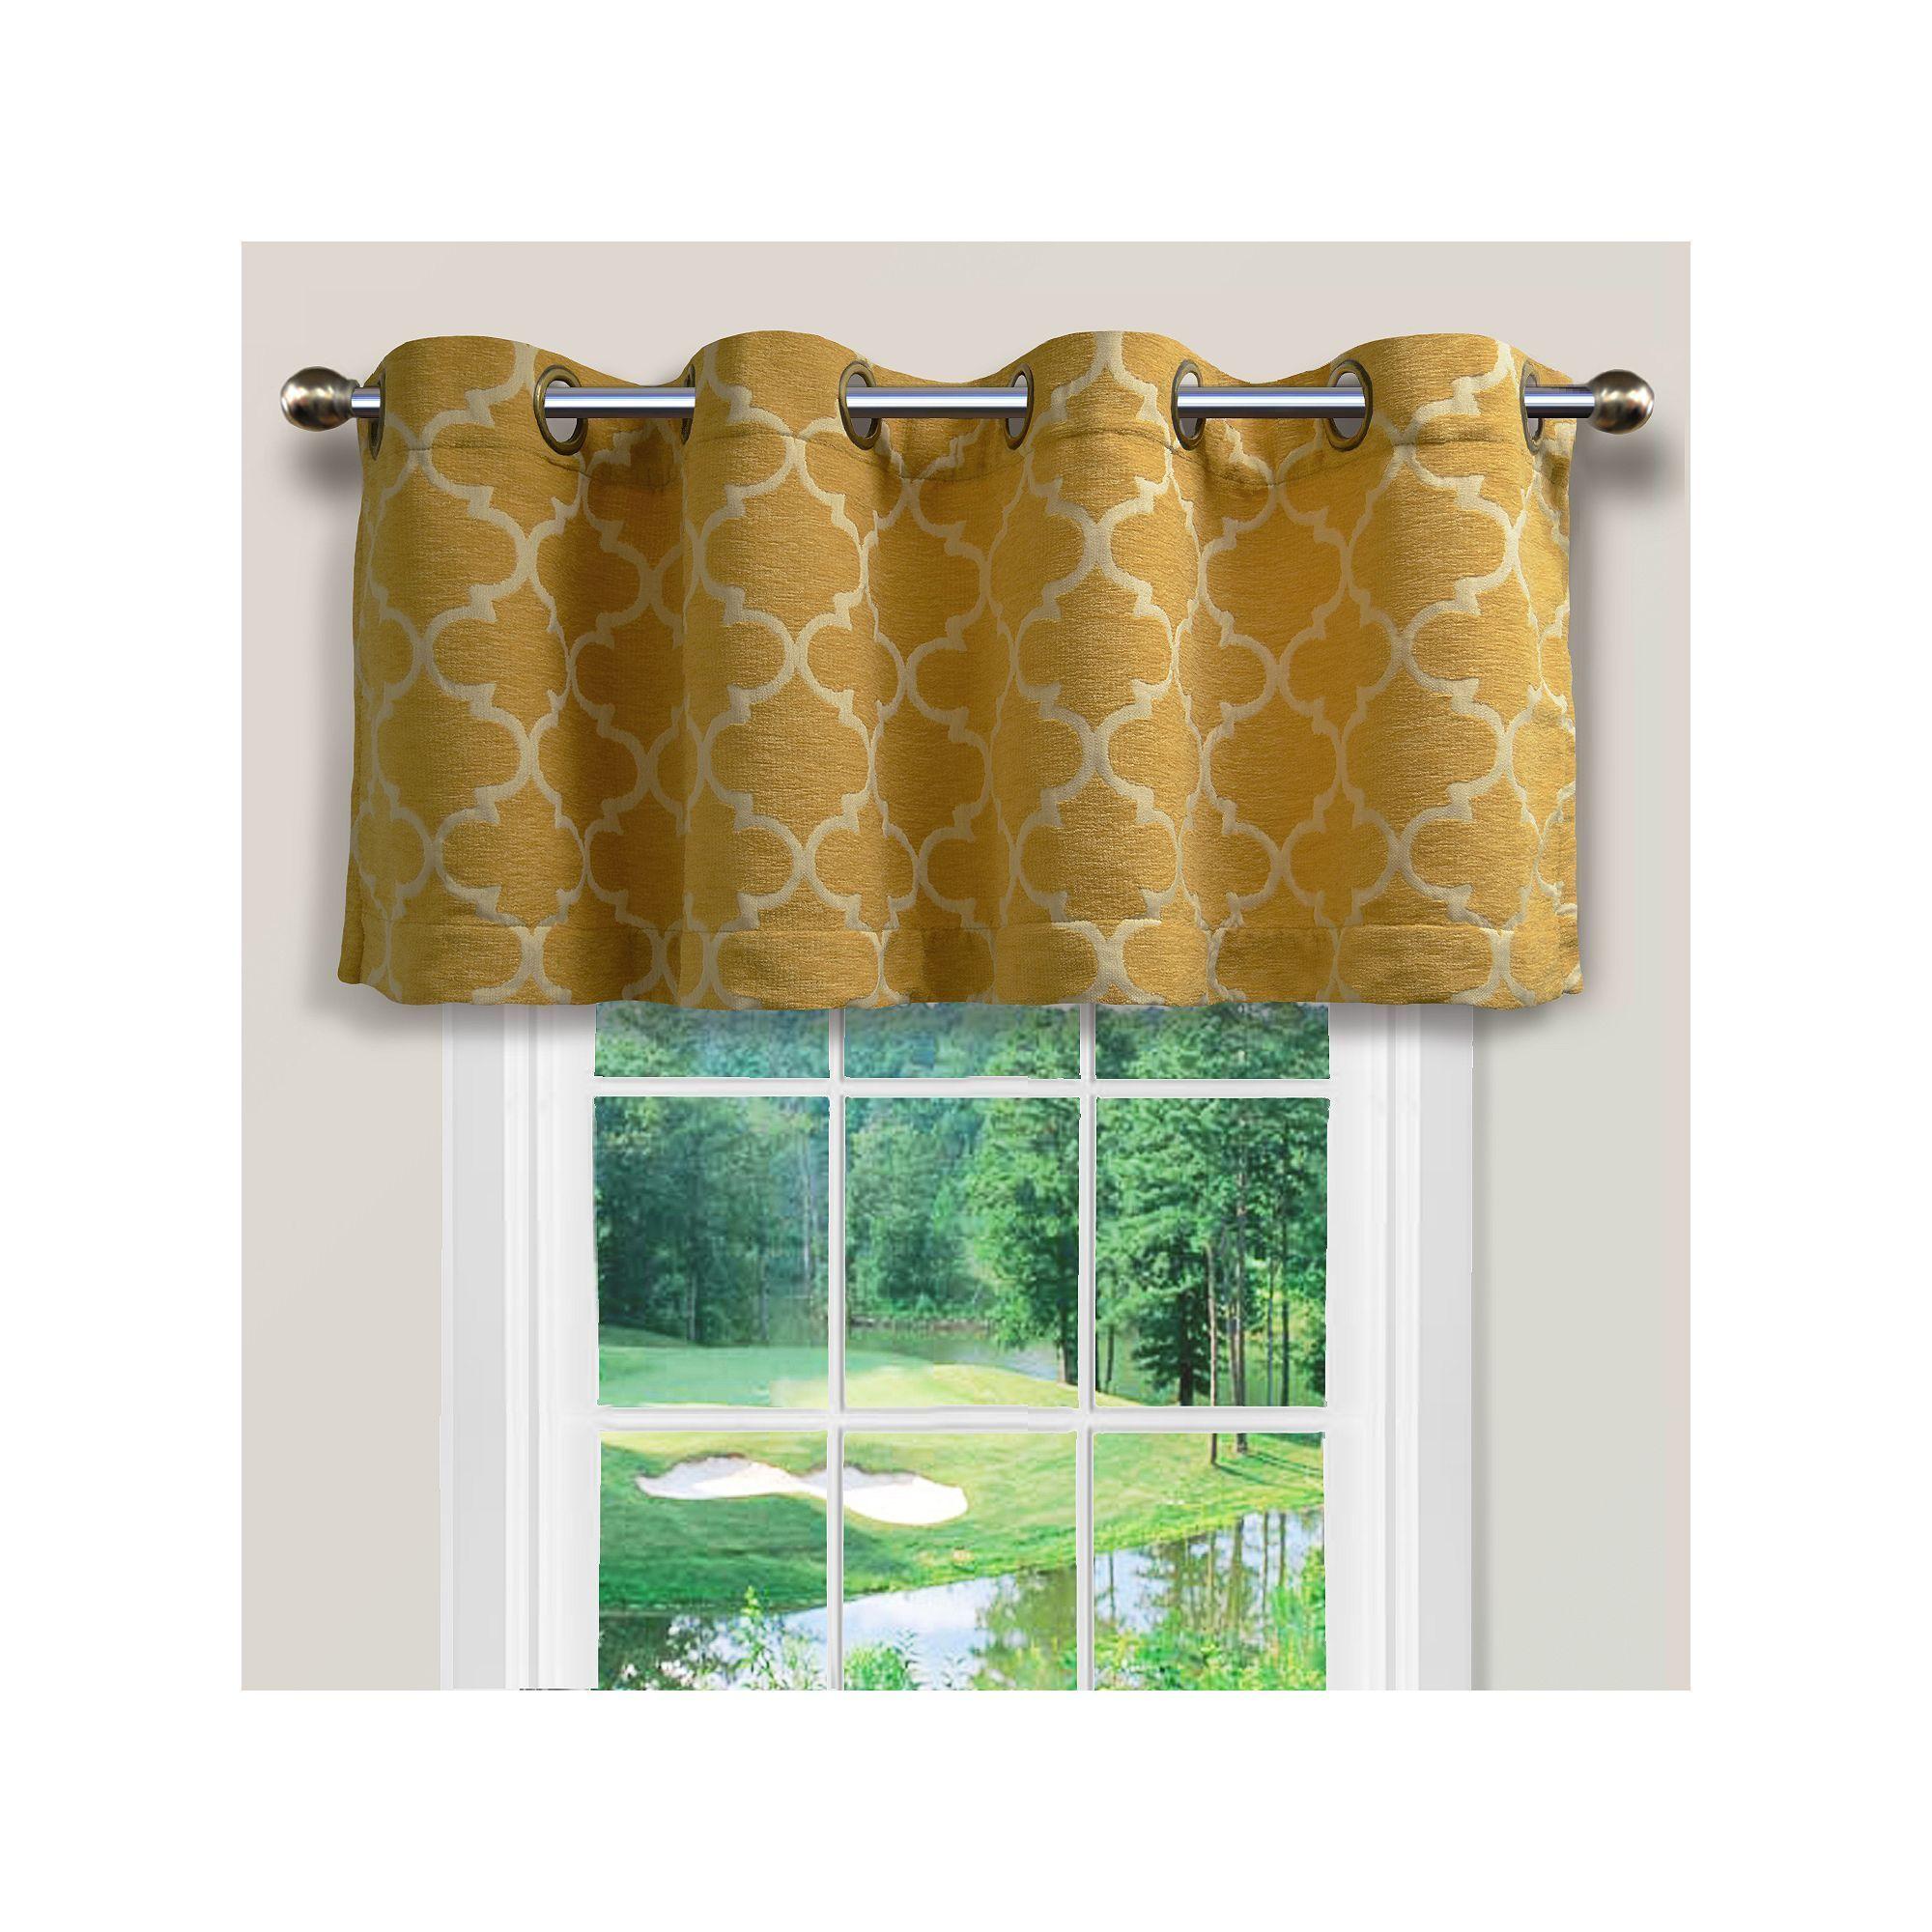 Spencer Home Decor Club Lattice Window Valance - 54 x 16 ...